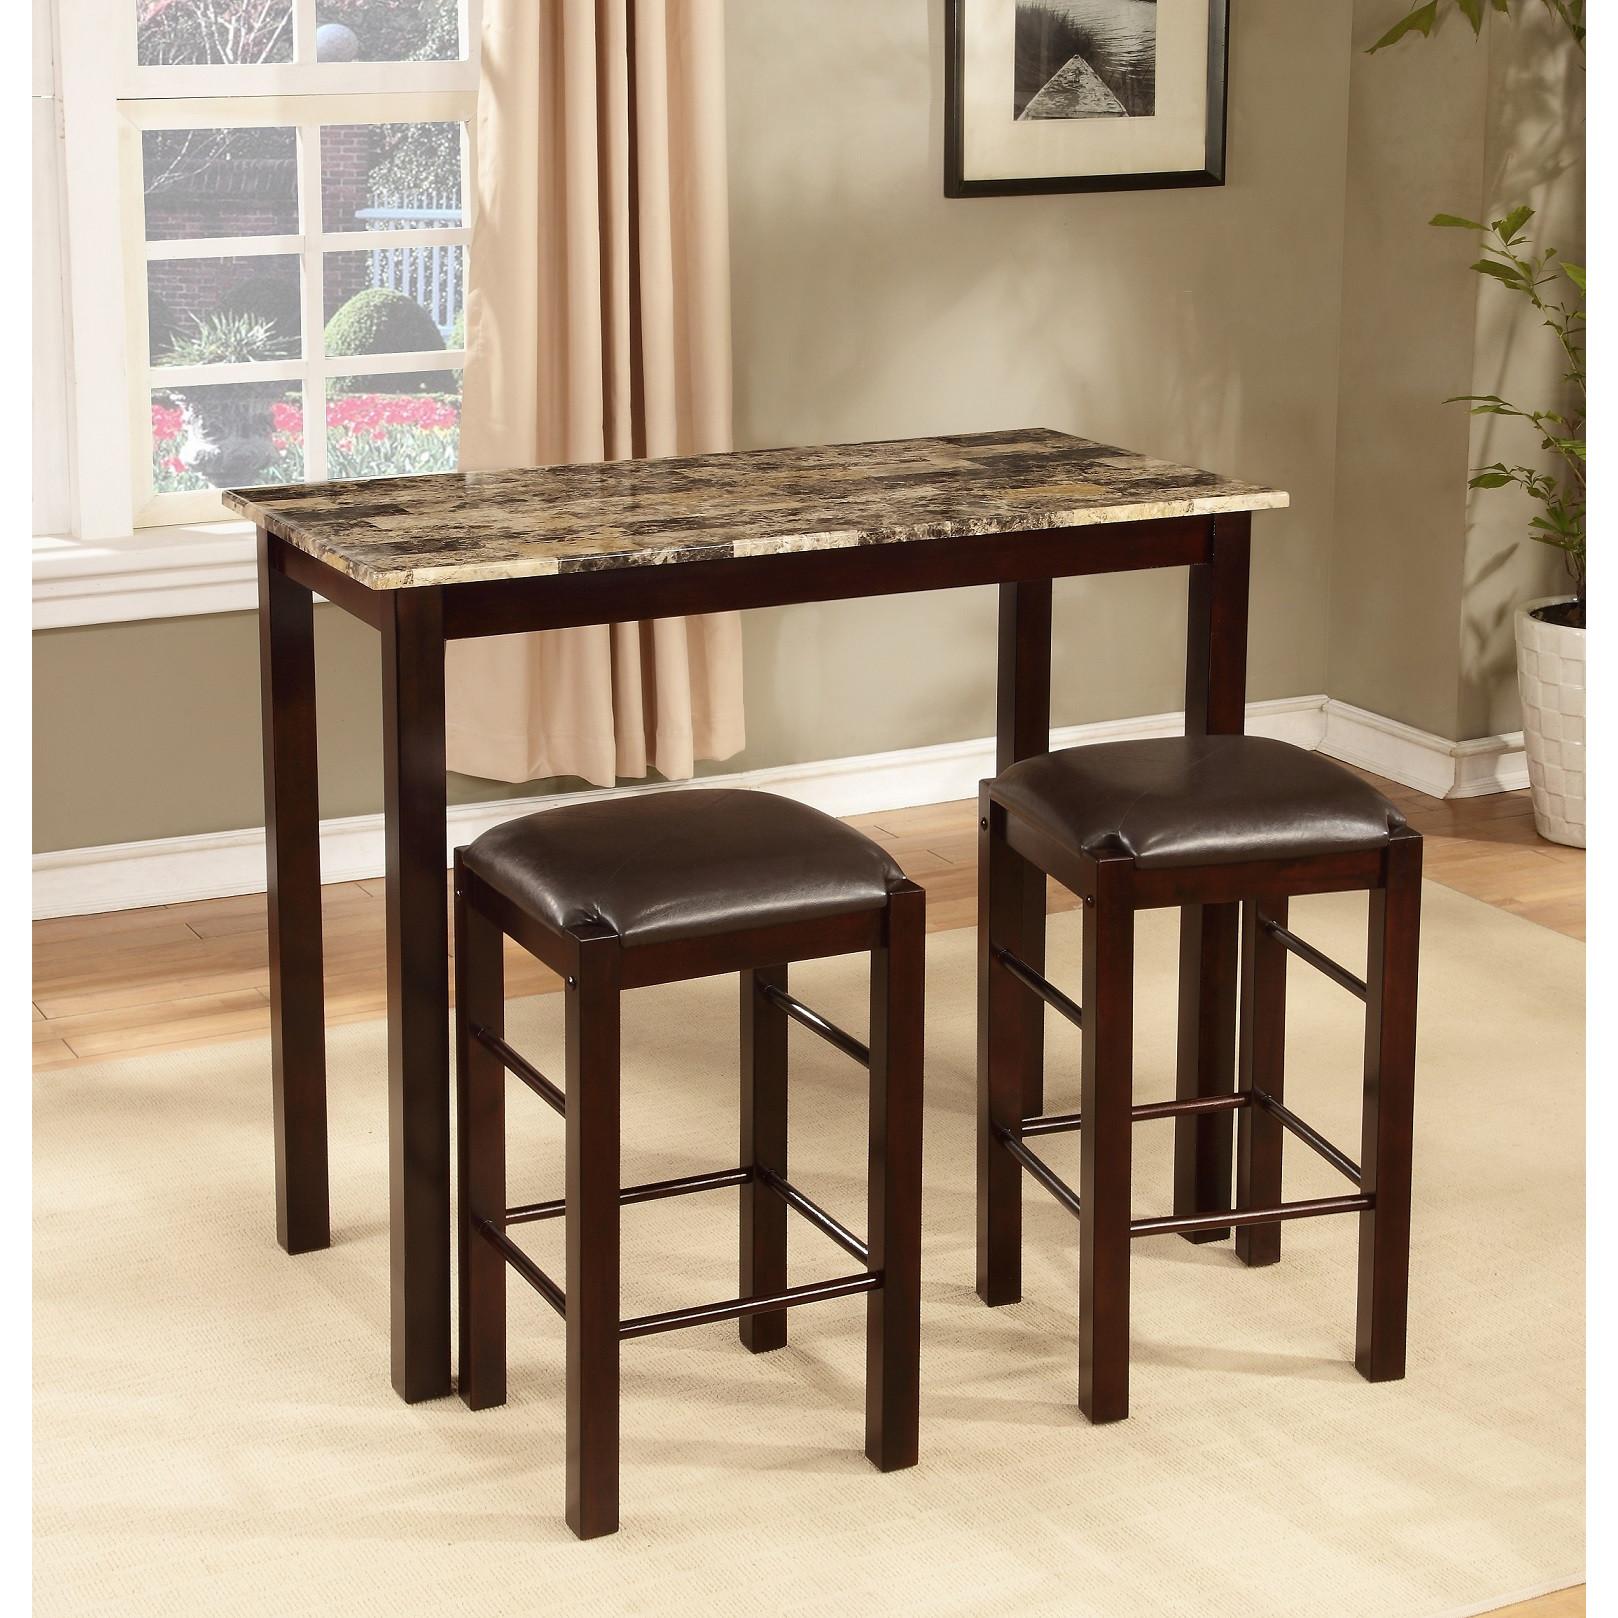 Popular Roundhill Furniture Brando 3 Piece Counter Height Dining Set counter height dining set